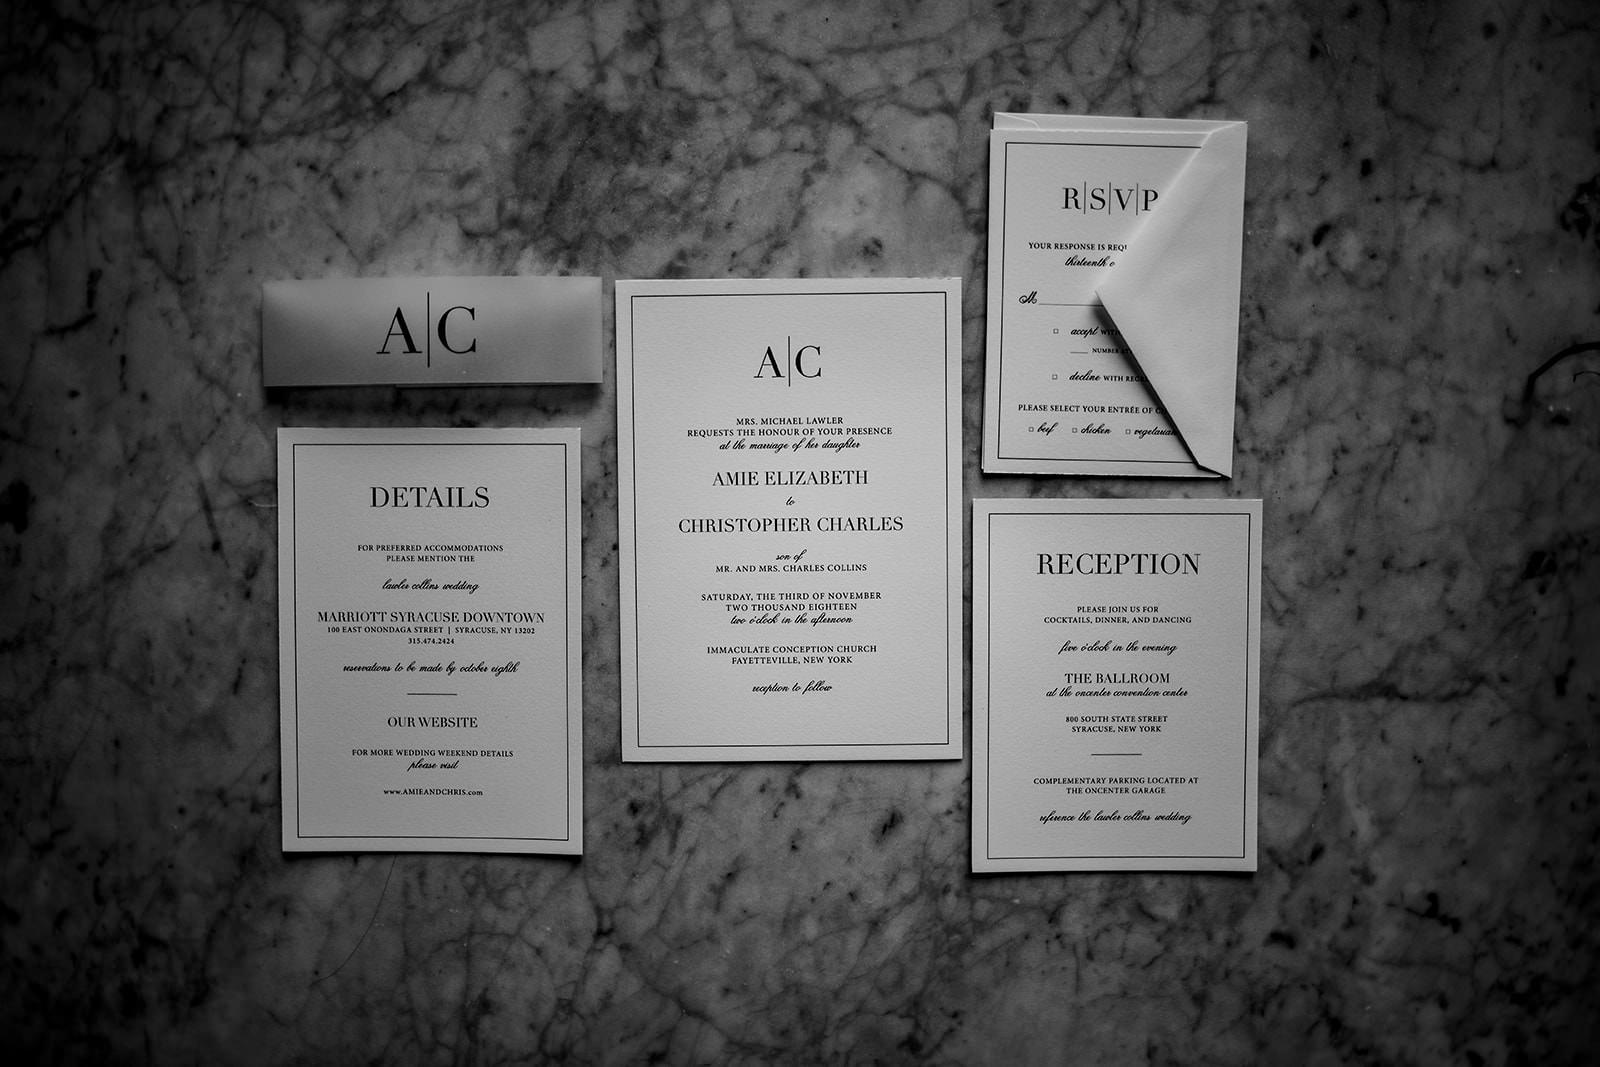 Syracuse NY wedding photography, syracuse ny wedding photographer, syracuse ny wedding photos, photos from syracuse ny, wedding photos, getting ready photos, photos of bridal prep, hair and make up prep, bridal hair, bridal makeup, wedding tips, wedding advice, bridal advice, wedding details, wedding photography advice, wedding photography tips, tips for better wedding photography